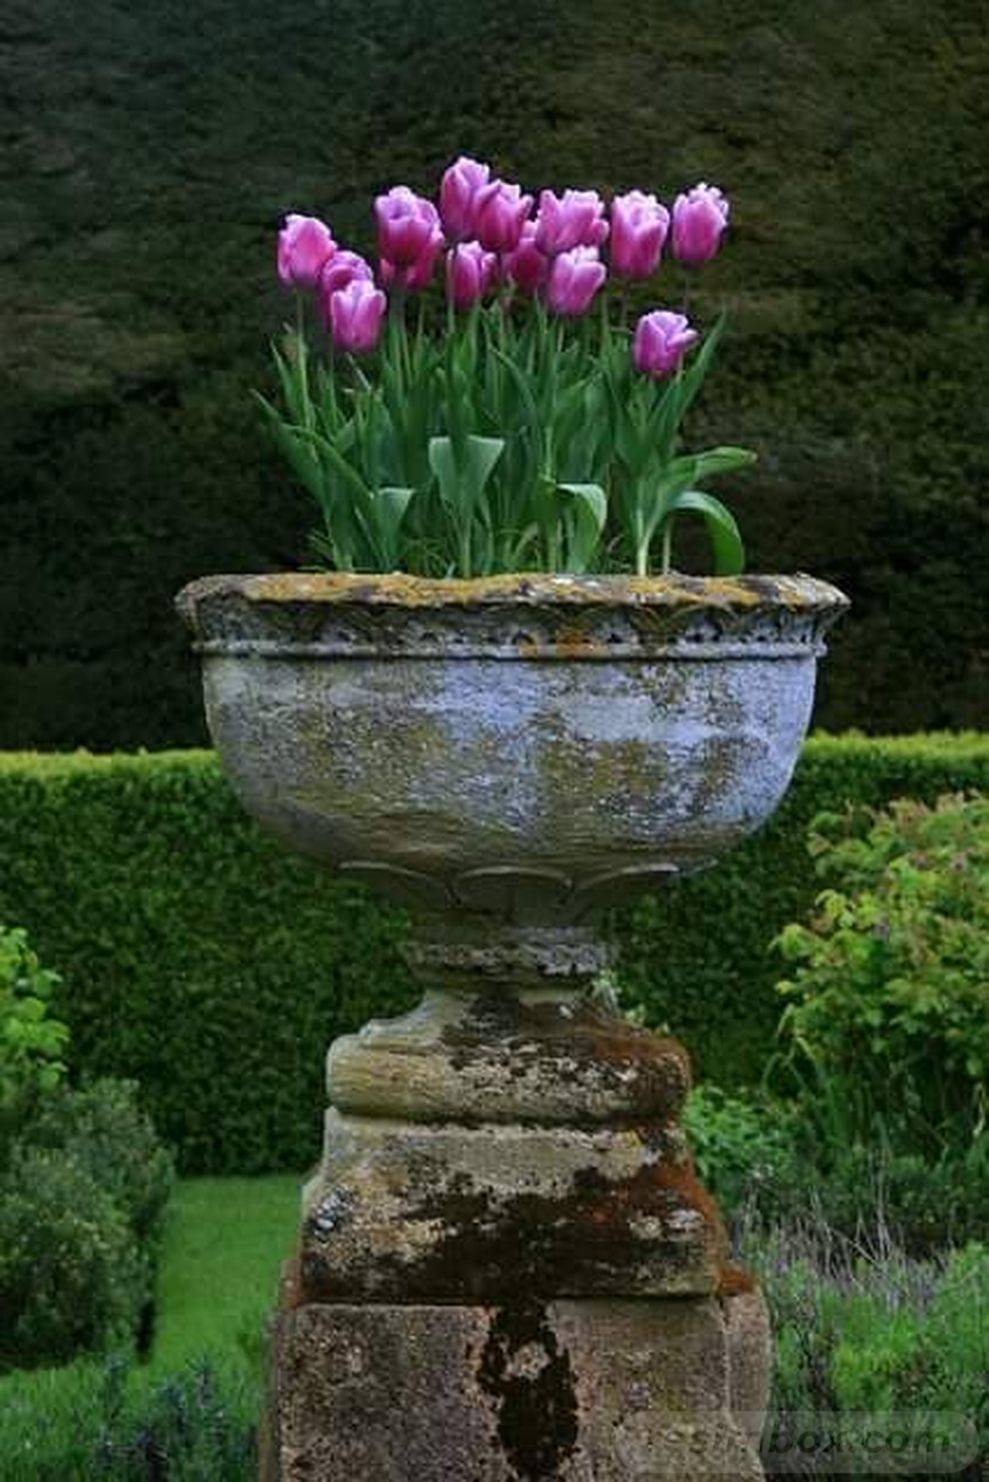 garden pot design-AYFI8TKpq7sEf8ojBU2-JJbe8JPKW4CK47v5S0Yx-P2HXHEazmoSIqg